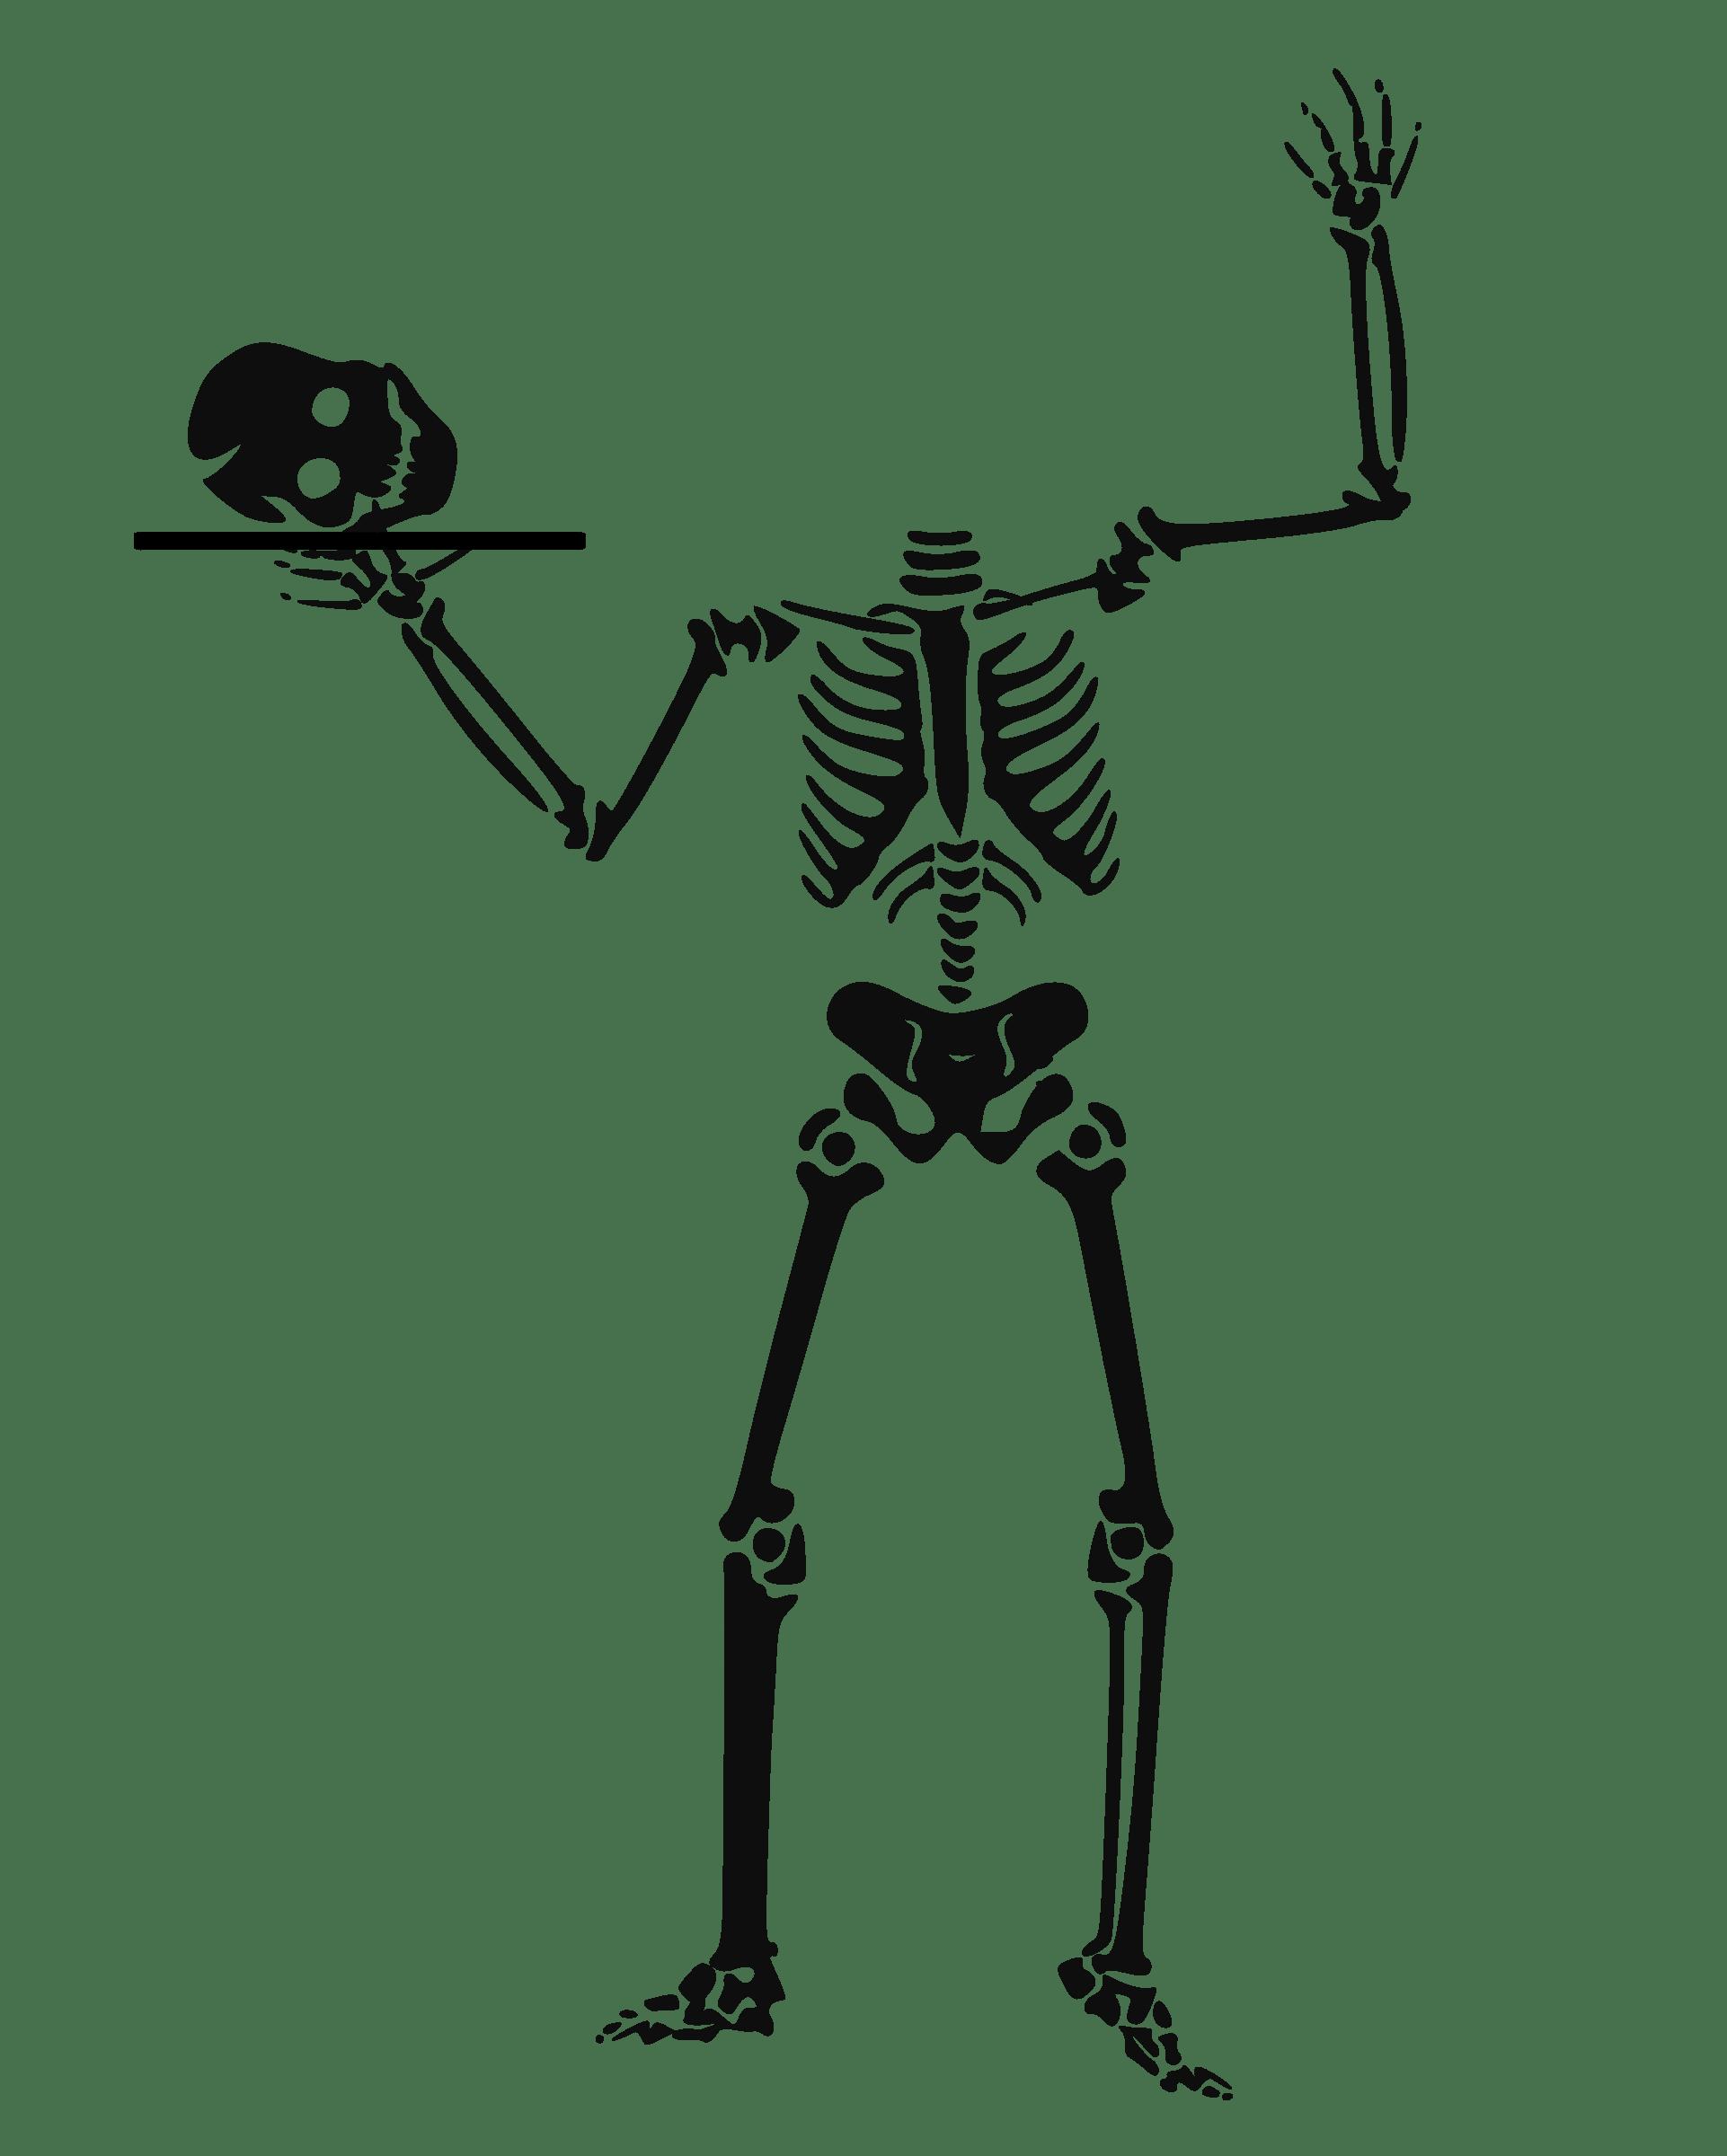 Clipart Skeleton Small Skeleton Clipart Skeleton Small